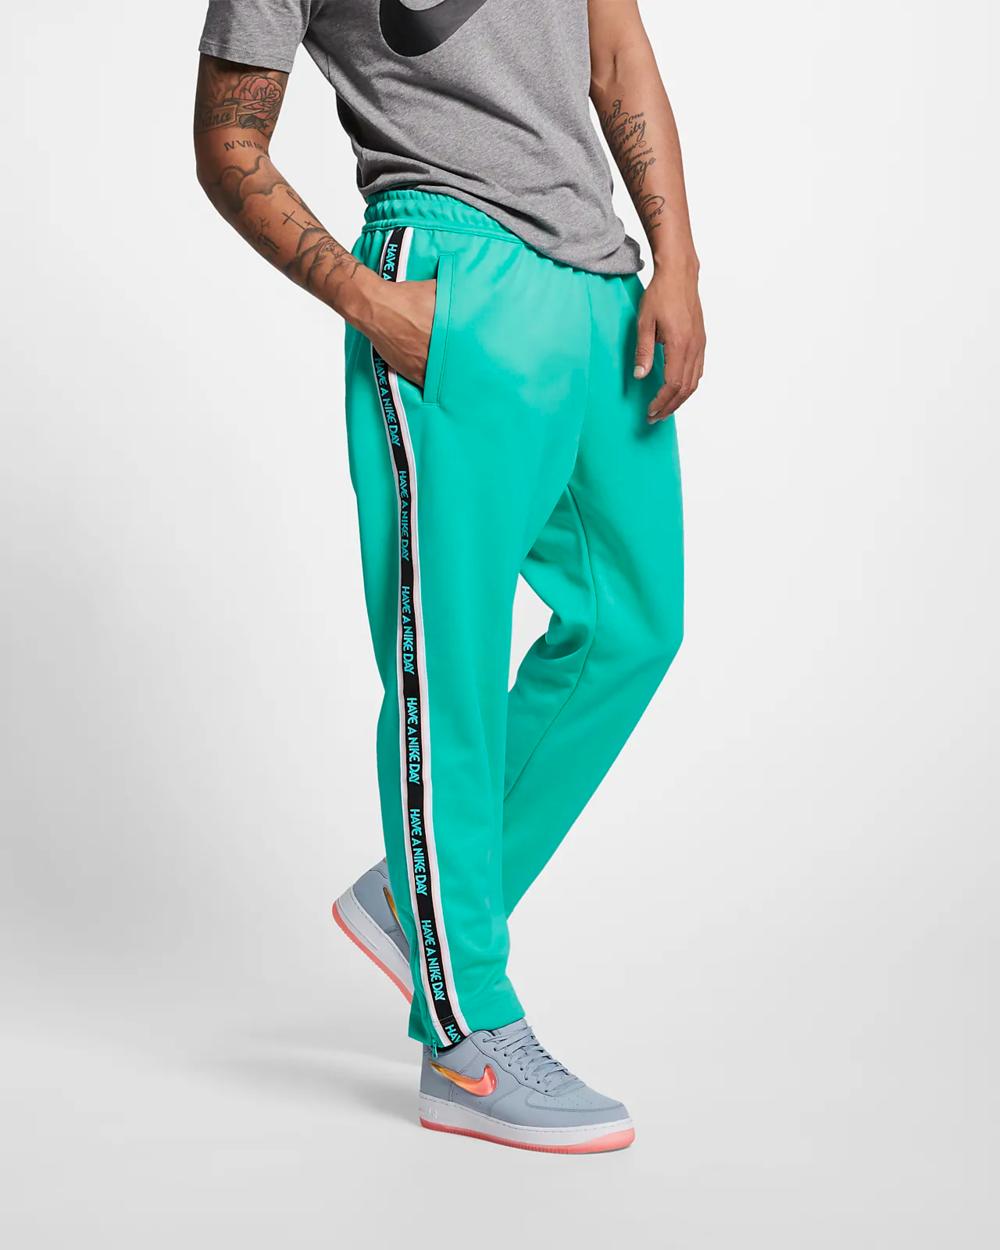 sportswear-mens-pants-xScPFG.png